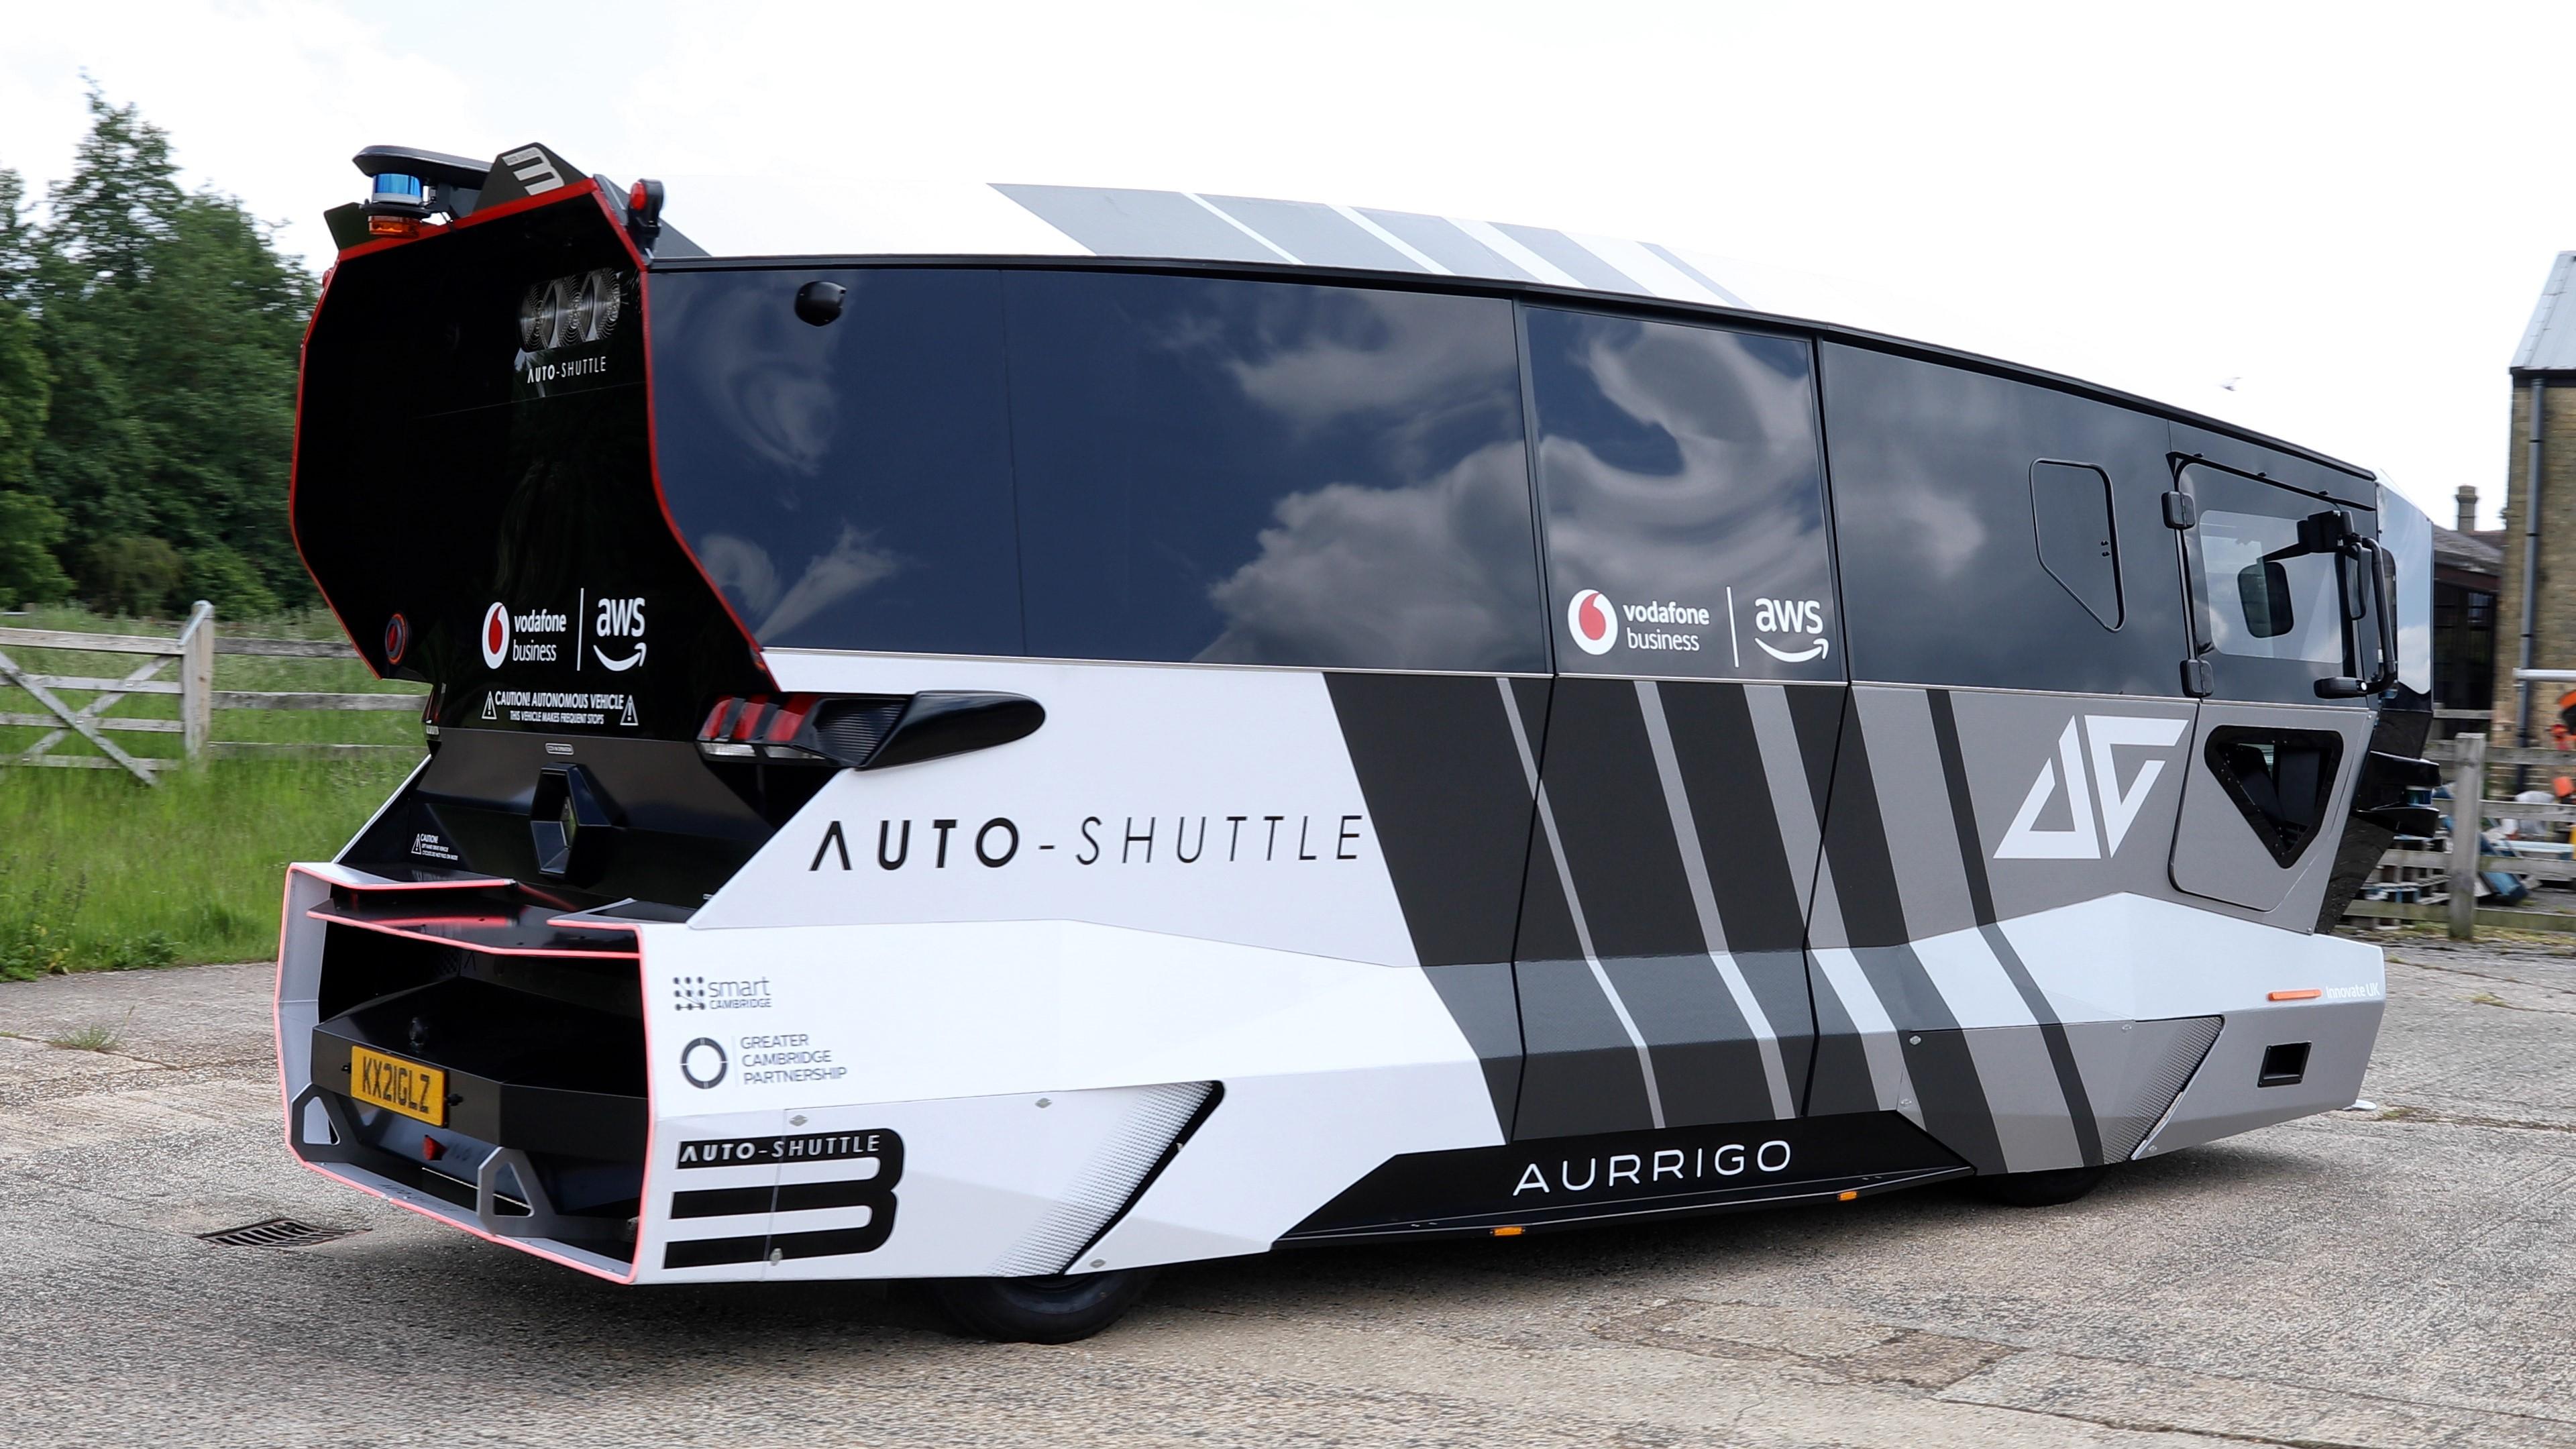 AWS shuttle